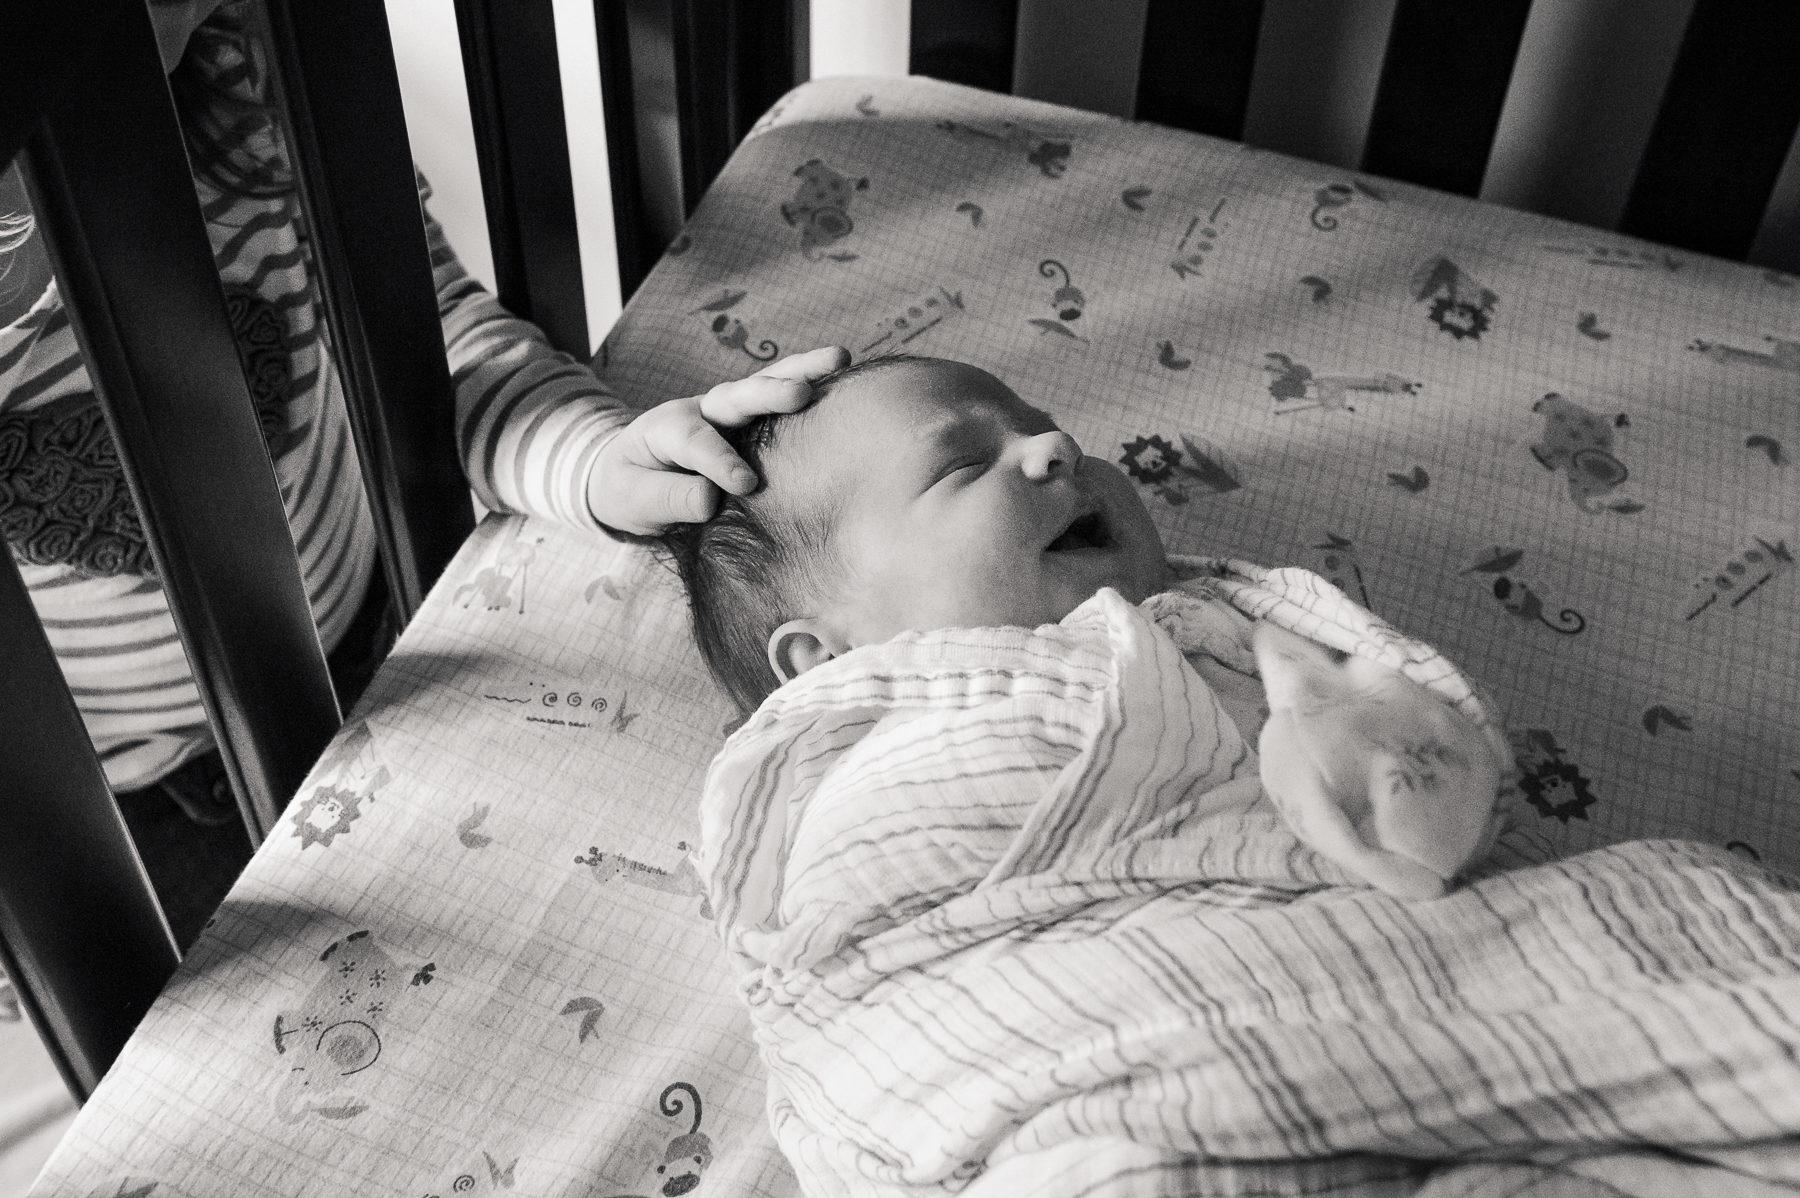 Big sister touching newborn sister's head through the crib